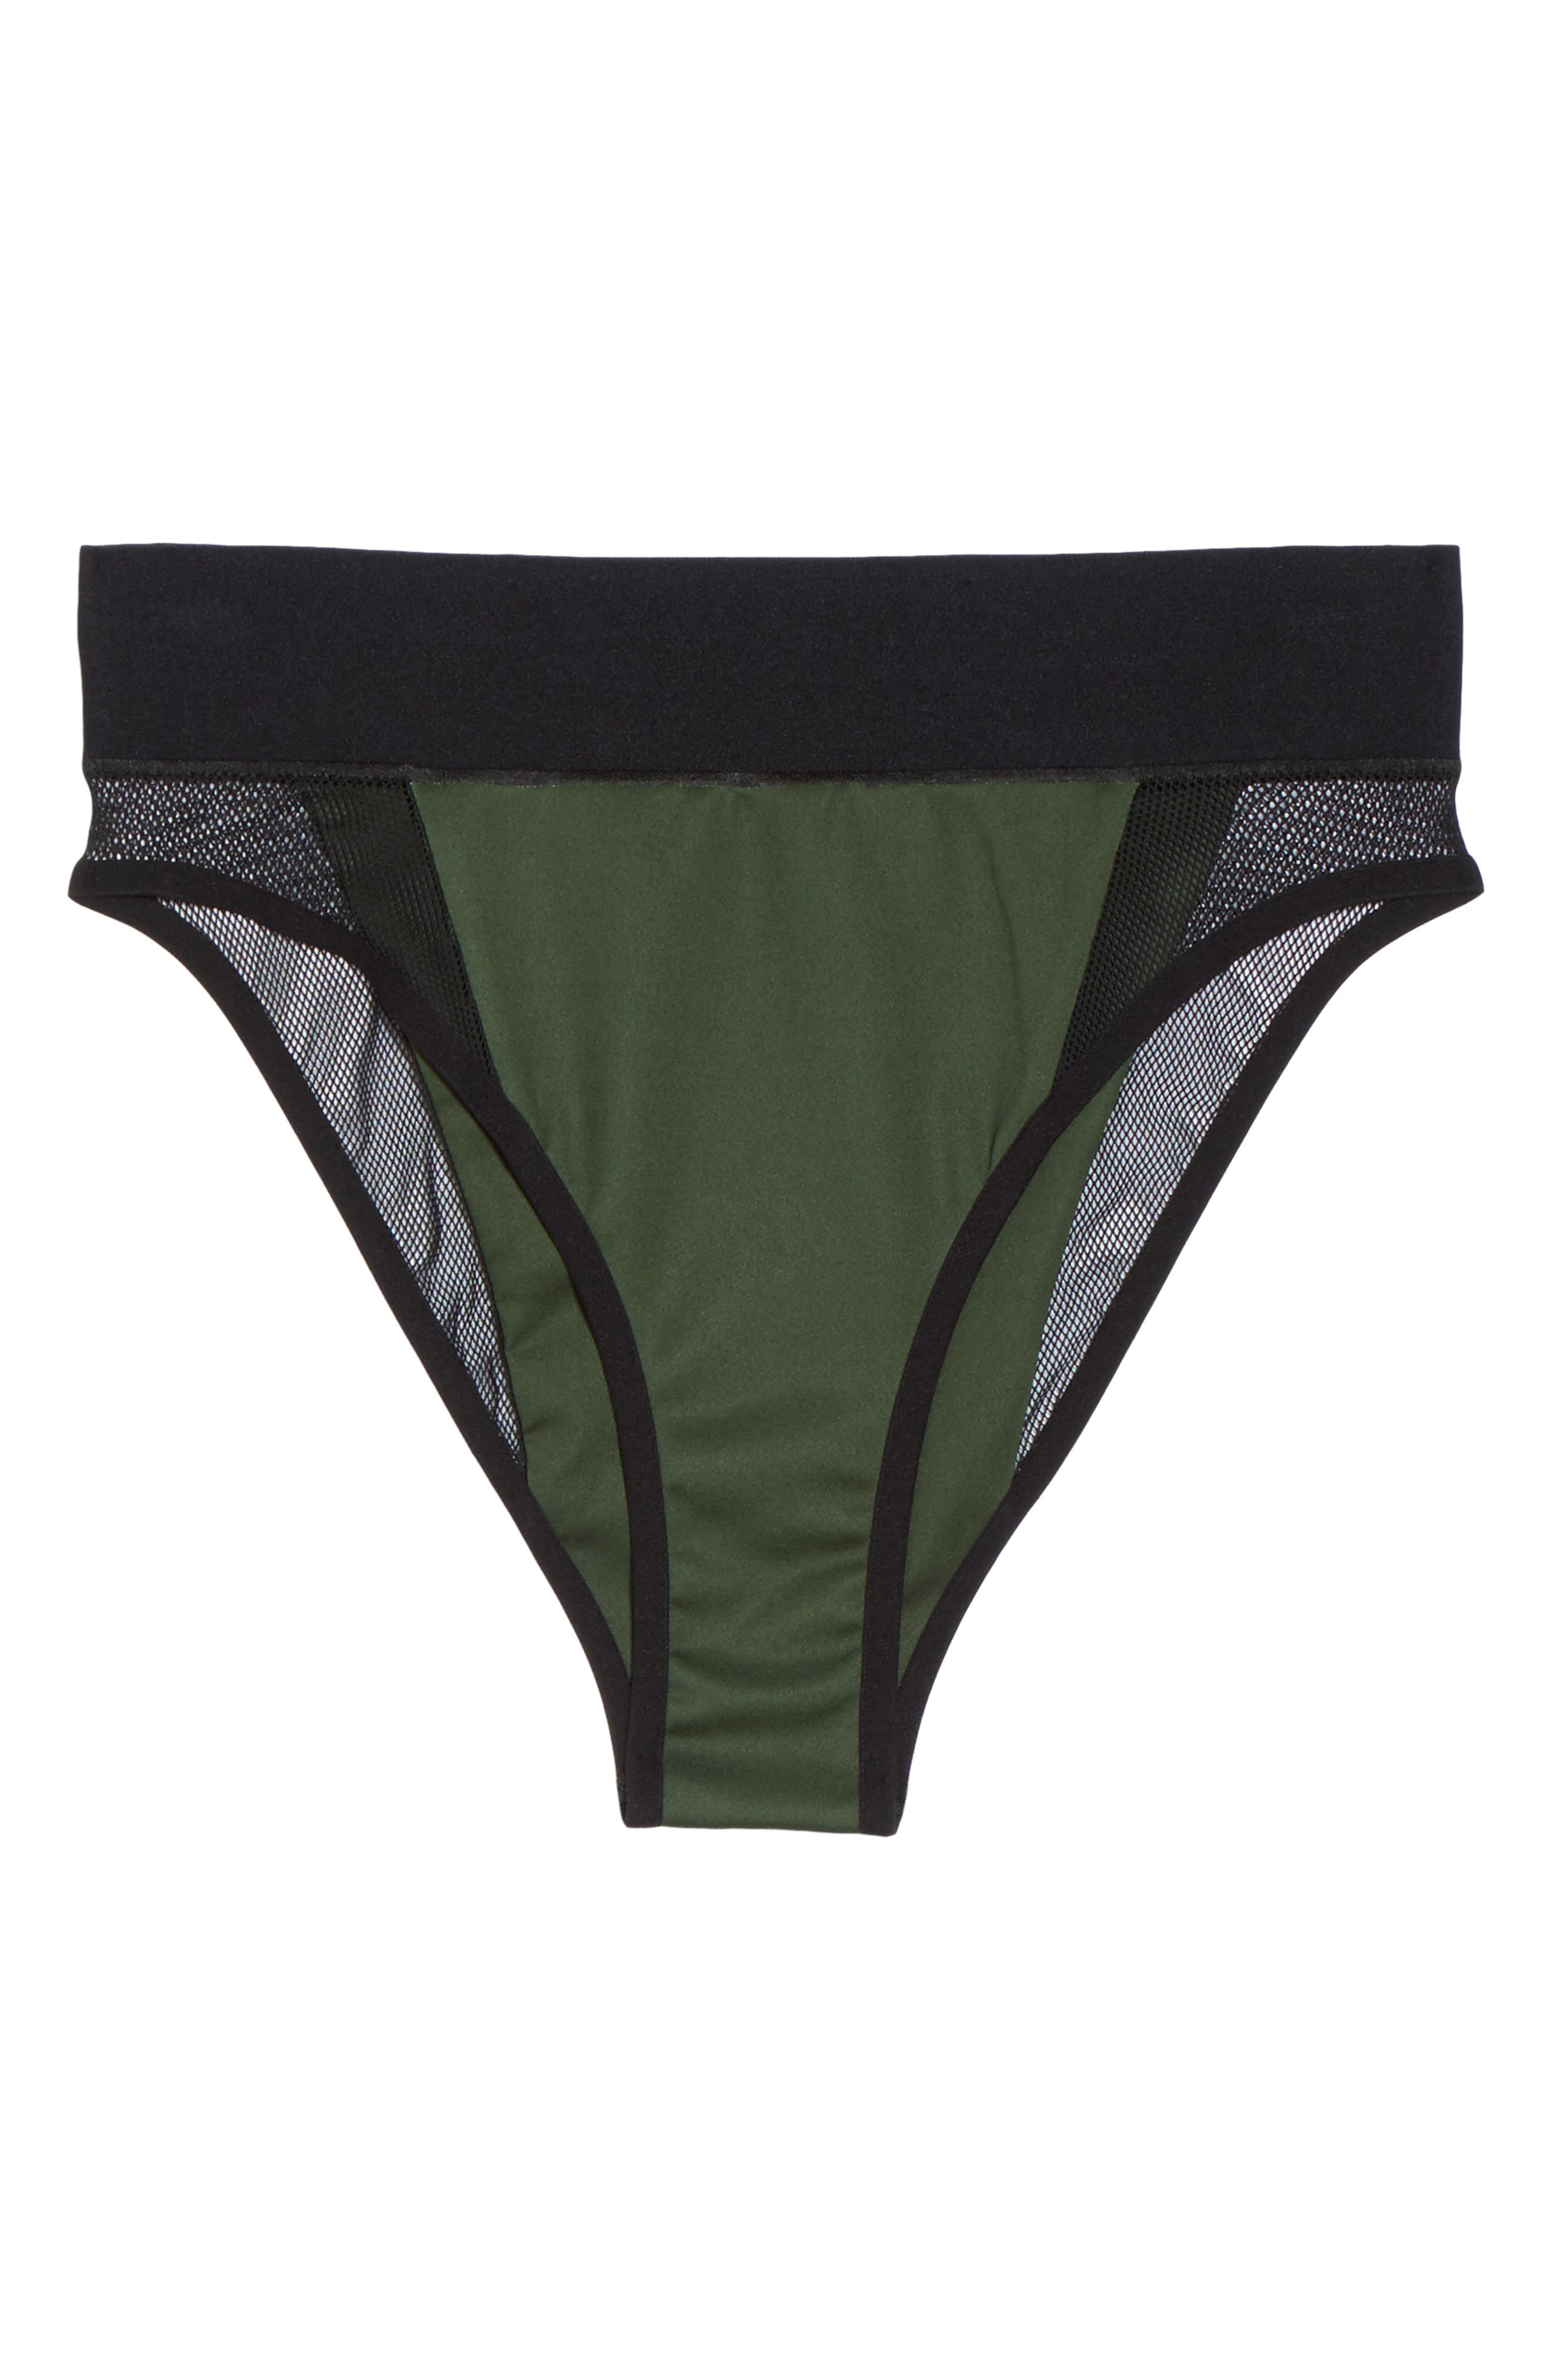 Reef Sport Mesh High-Waist Bikini Bottoms,                             Alternate thumbnail 6, color,                             302